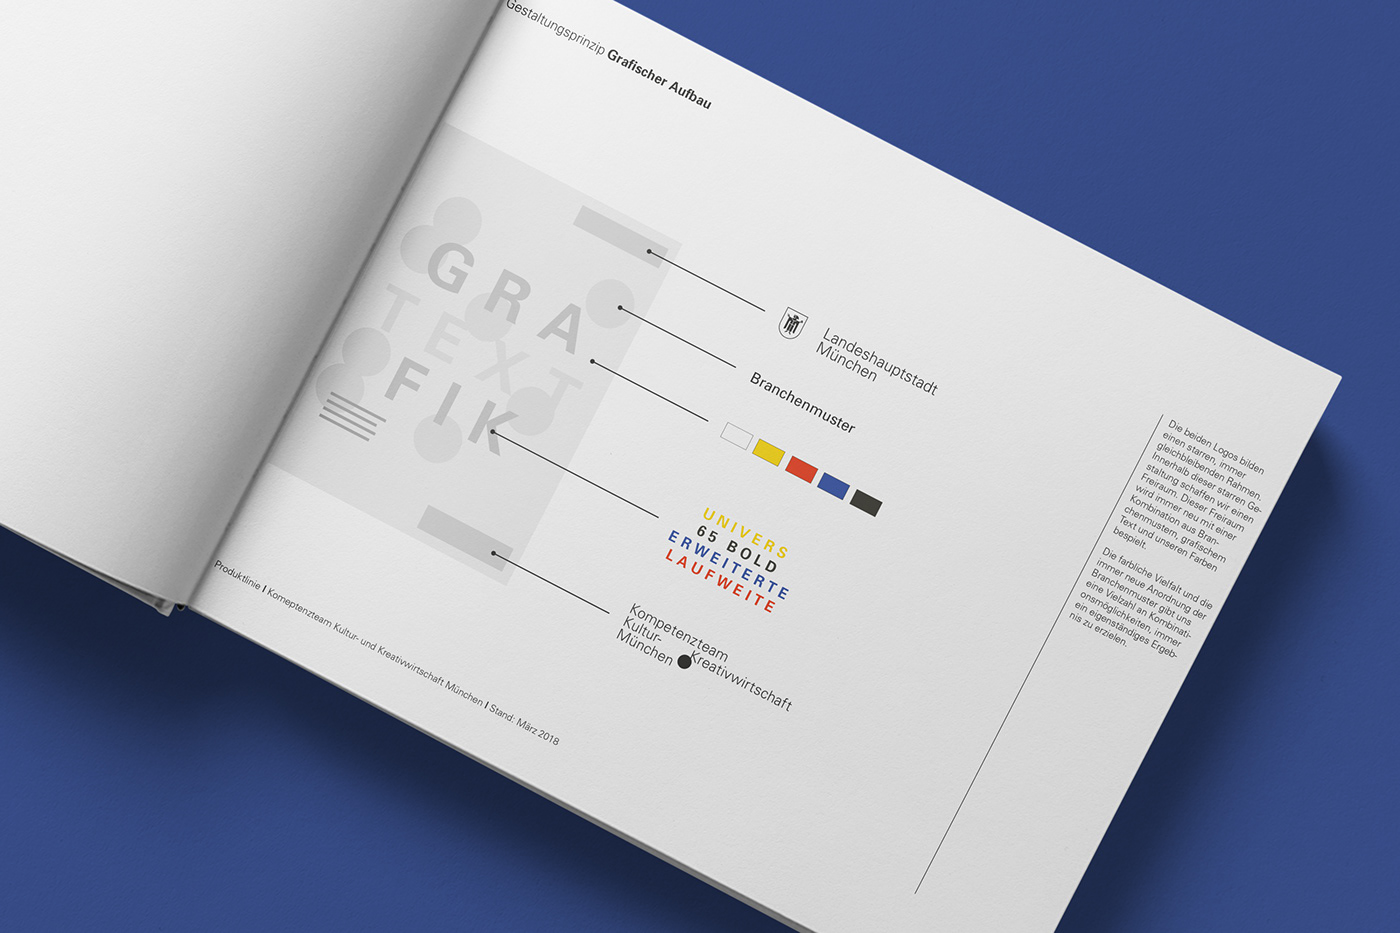 Artdirektion BrandArchitecture concept corporatedesign corporatedesignmanual DesignConcept informationarchtecture logodesign Screendesign text